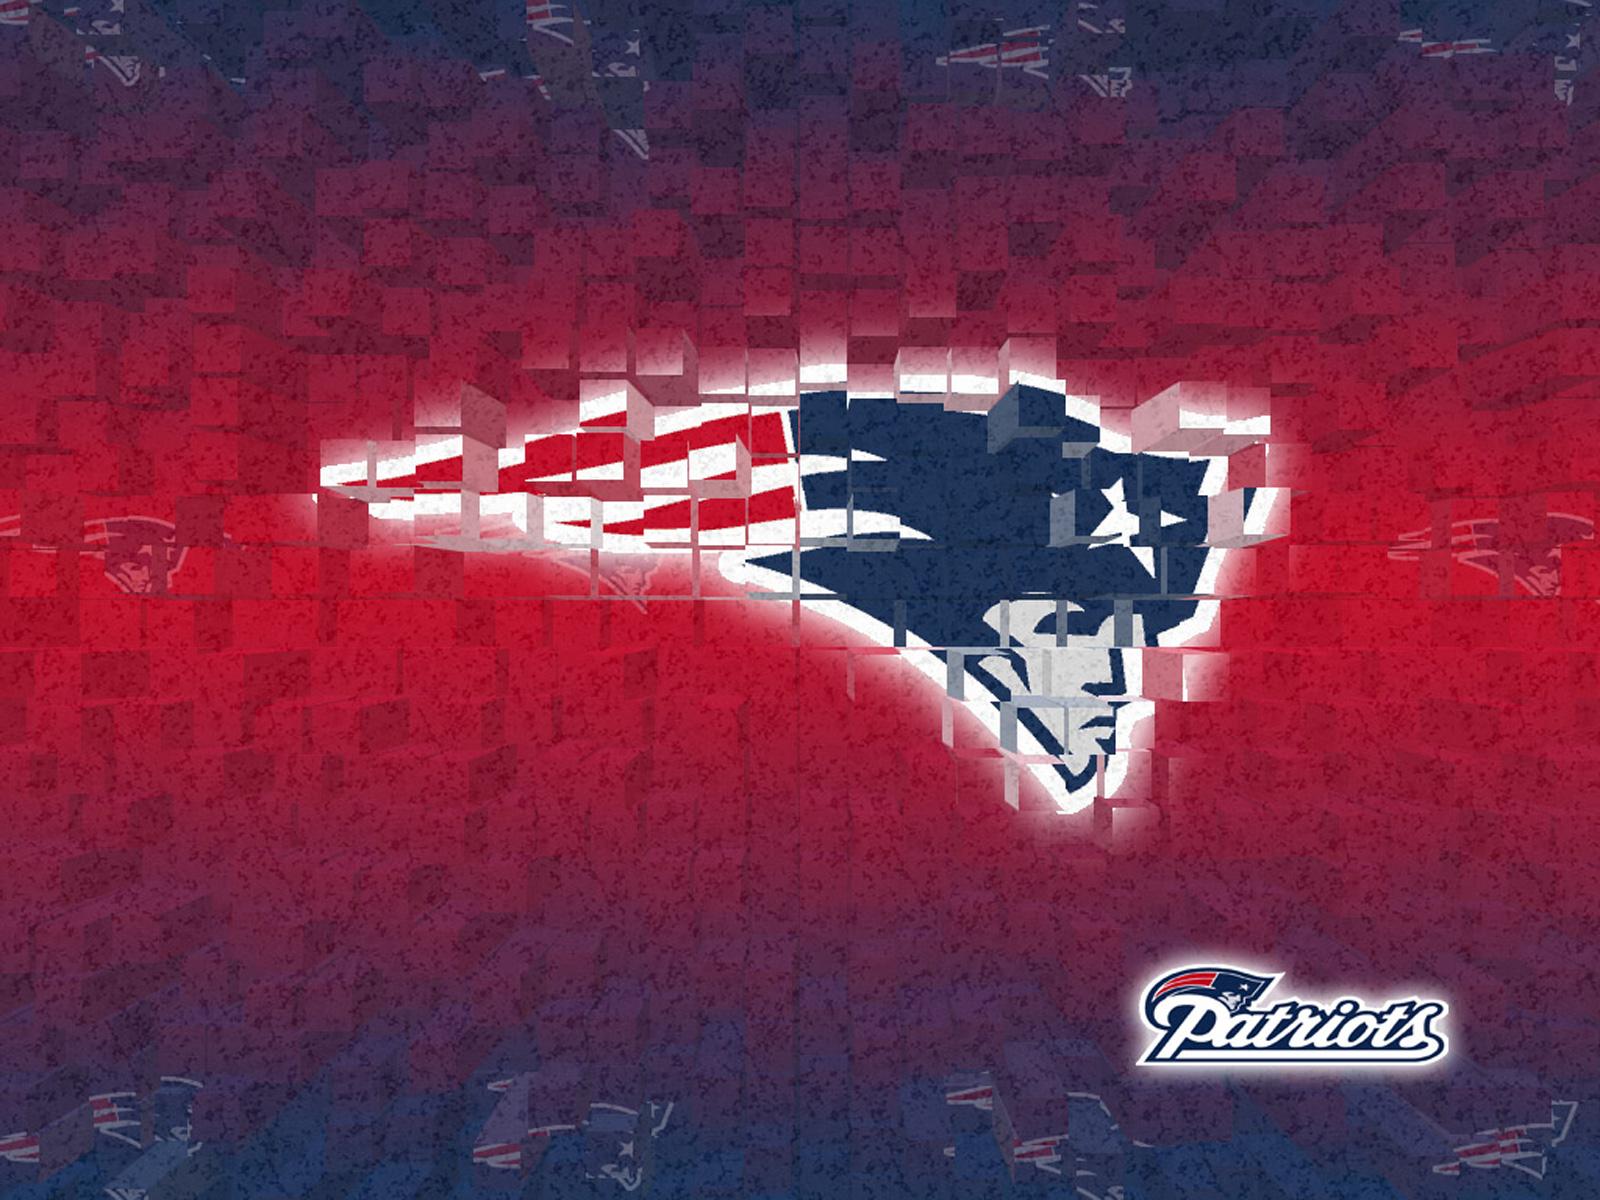 New England Patriots wallpaper HD Background iPhones Wallpapers 1600x1200